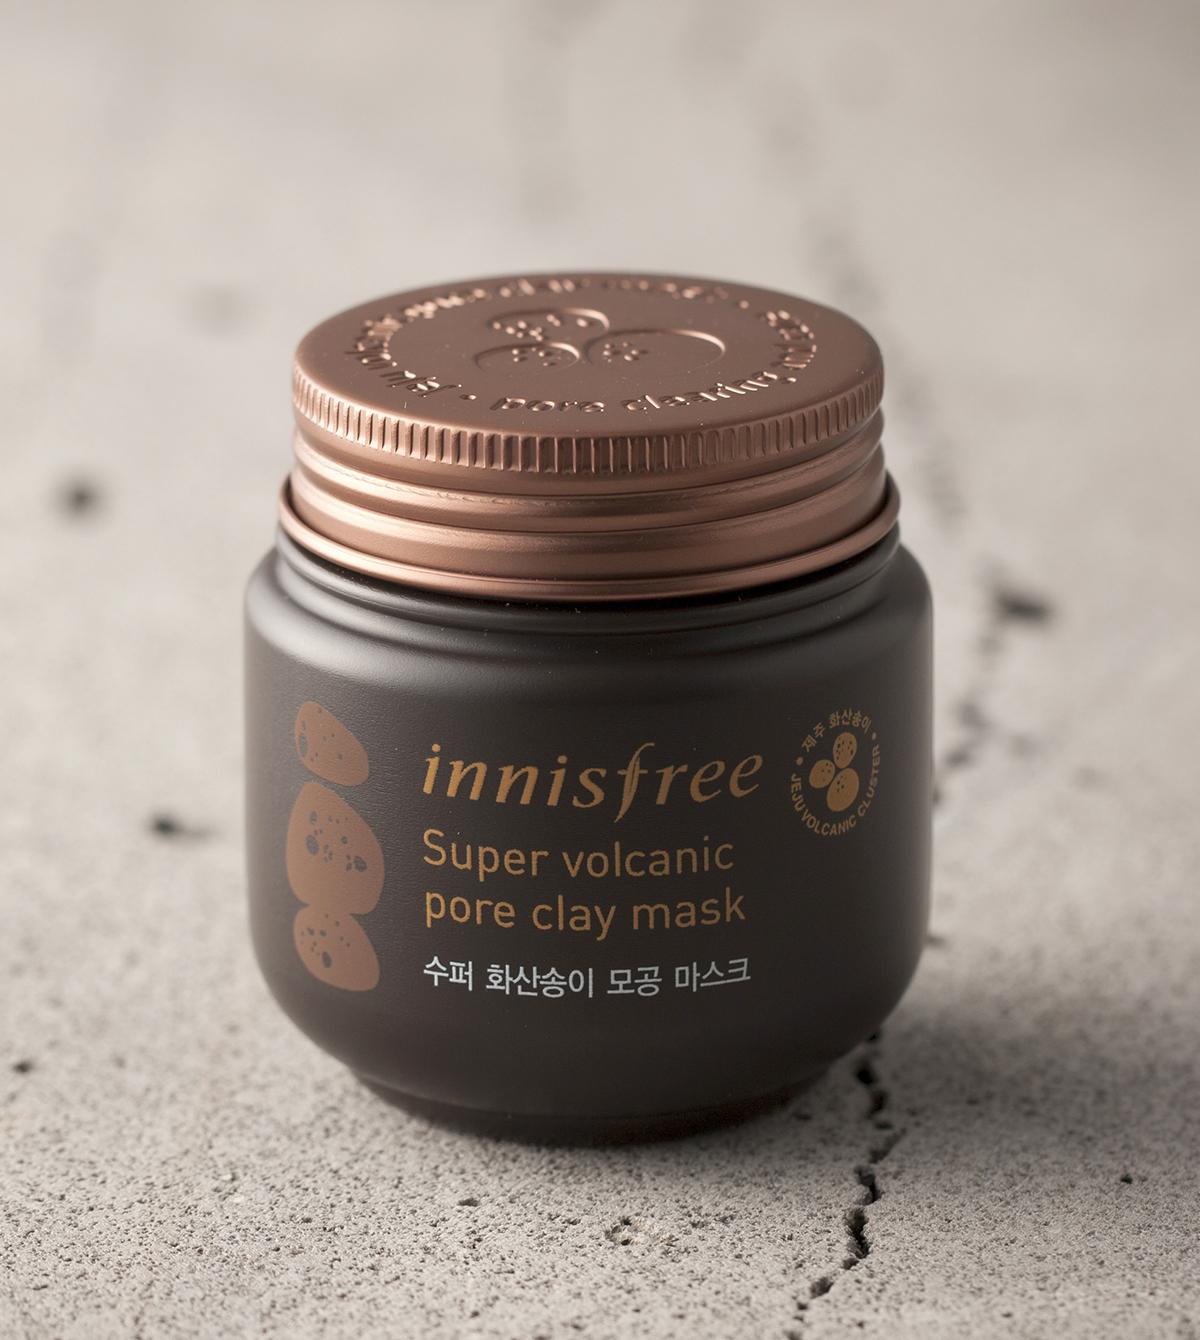 (Innisfree, Super Volcanic Pore Clay Mask 2x, P 804.93)